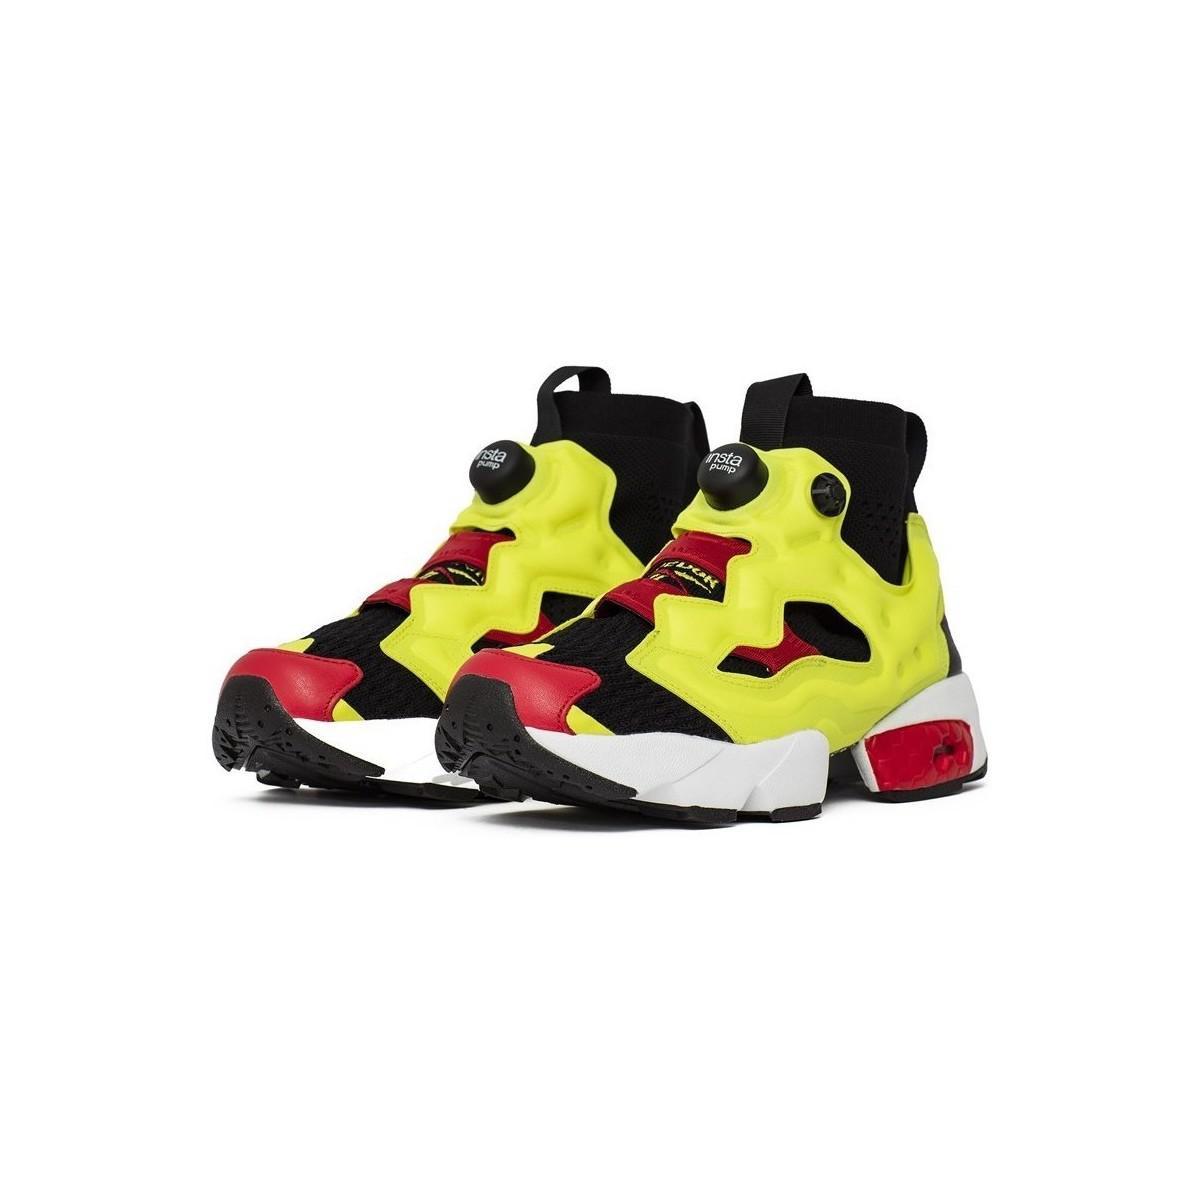 Reebok Instapump Fury Og U Blackhypergreenrbk Men's Shoes (high-top Trainers) In Red for Men